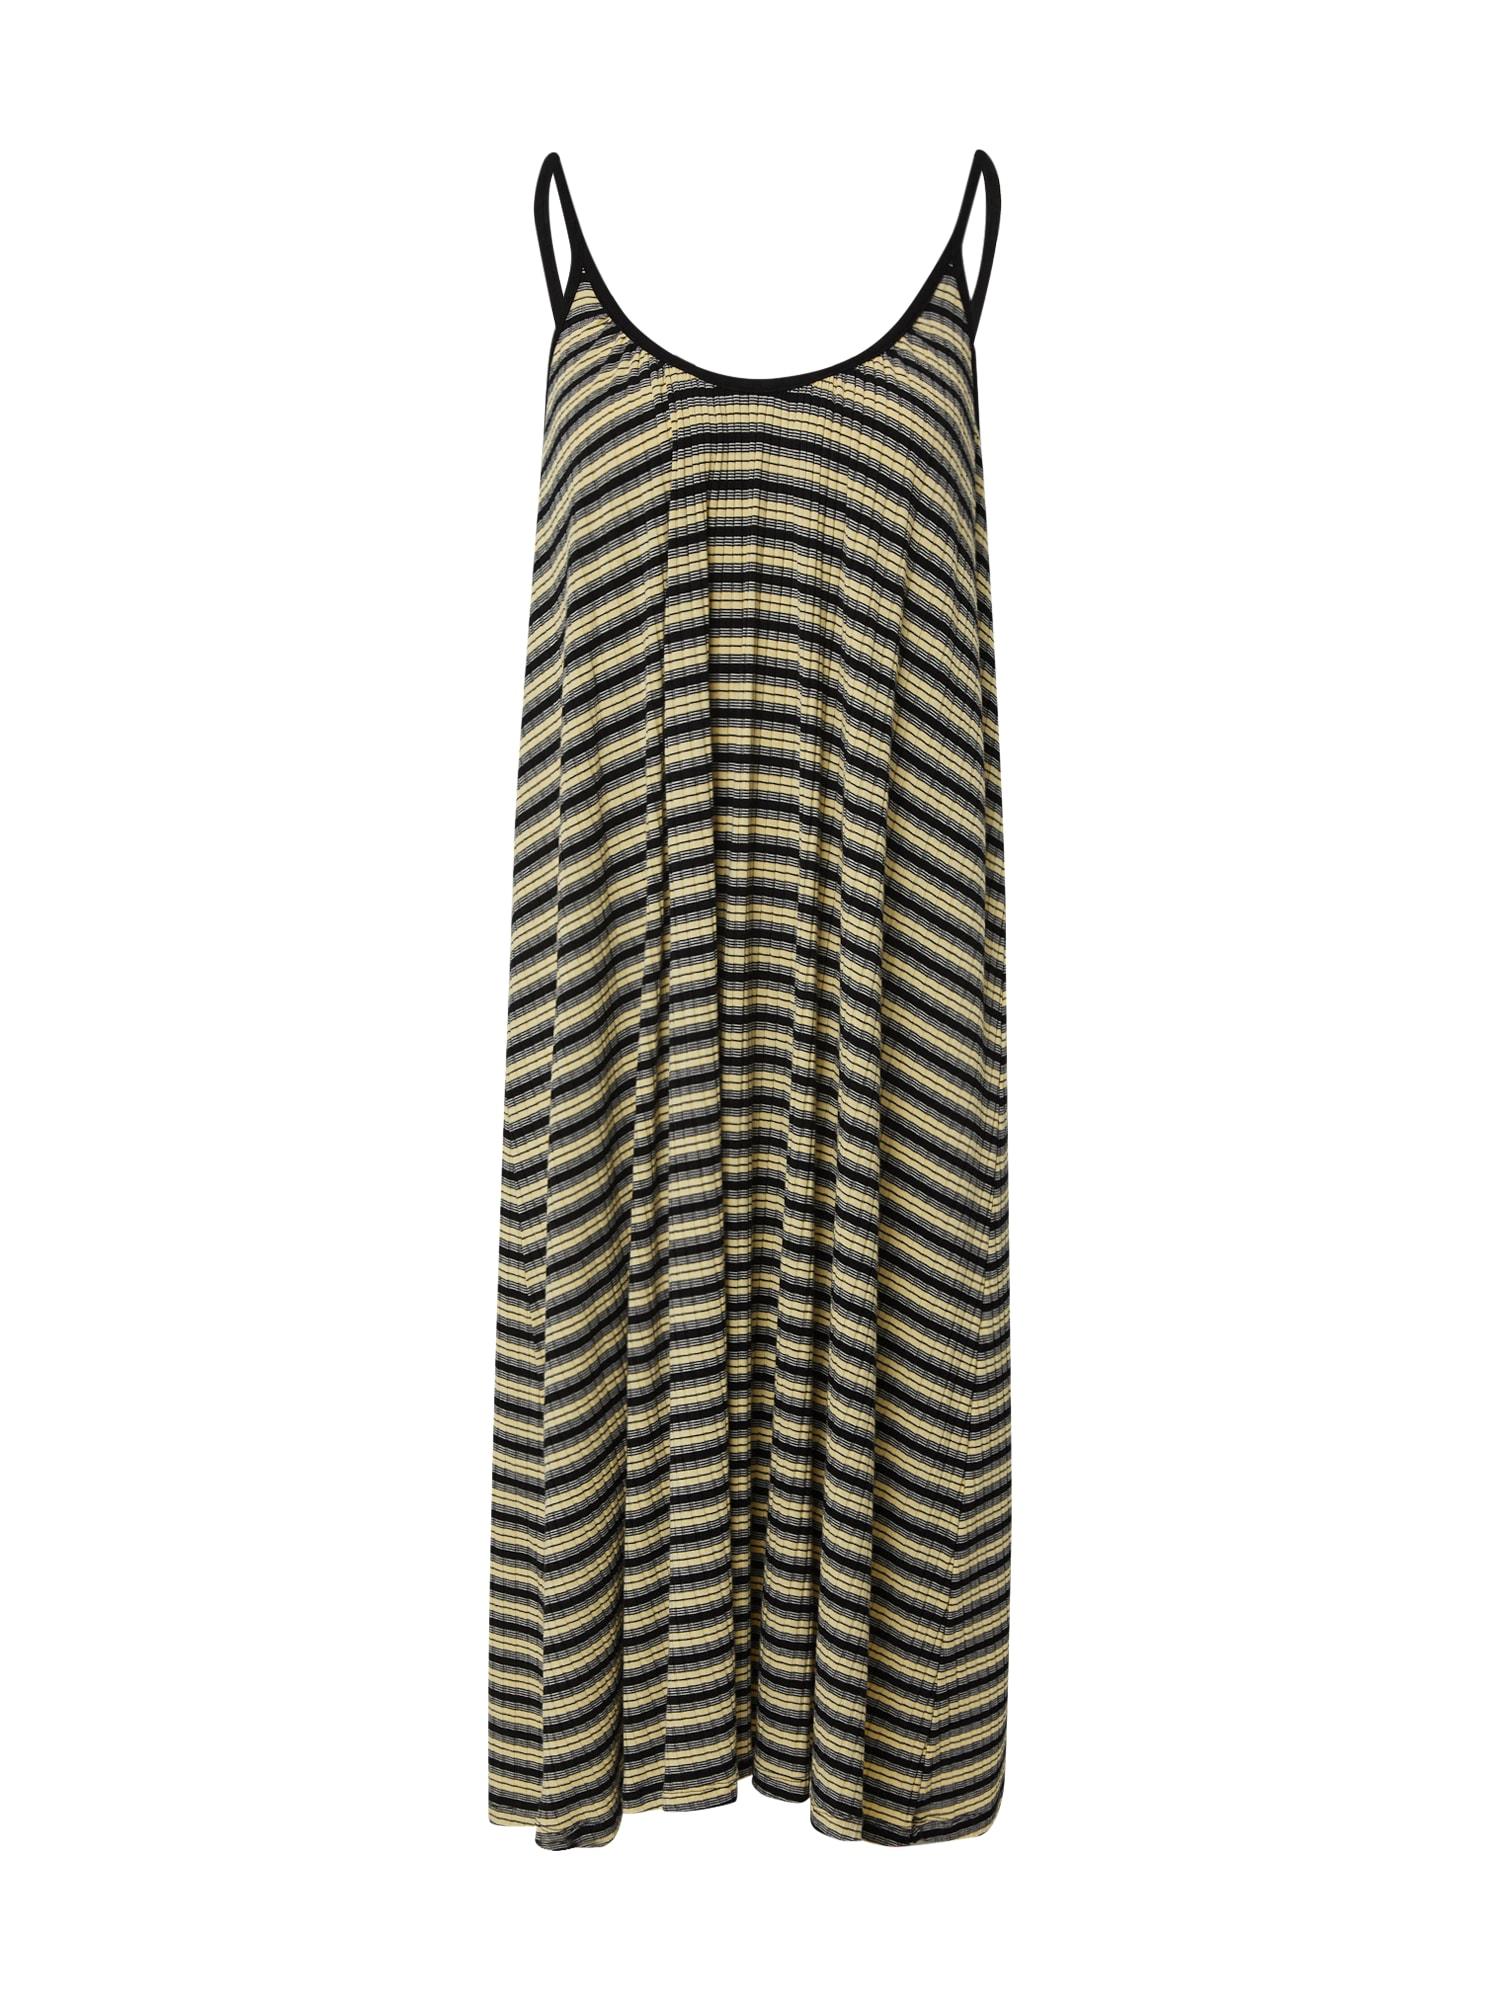 MADS NORGAARD COPENHAGEN Šaty  bílá / černá / žlutá